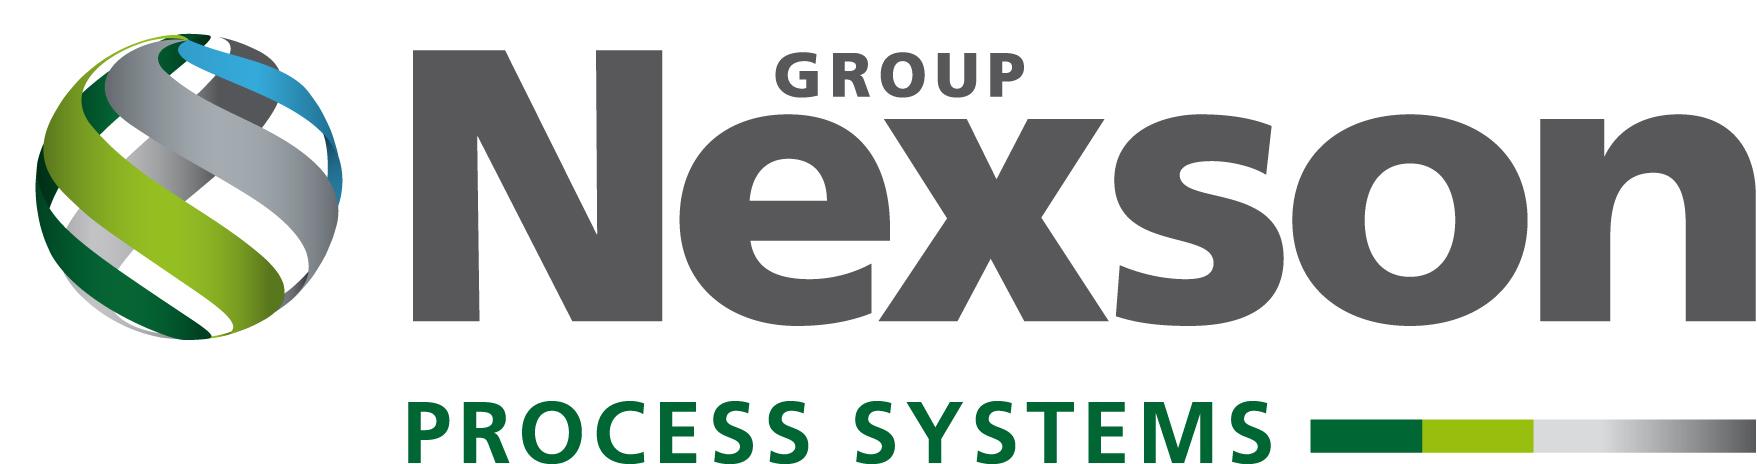 Nexson Logo 3